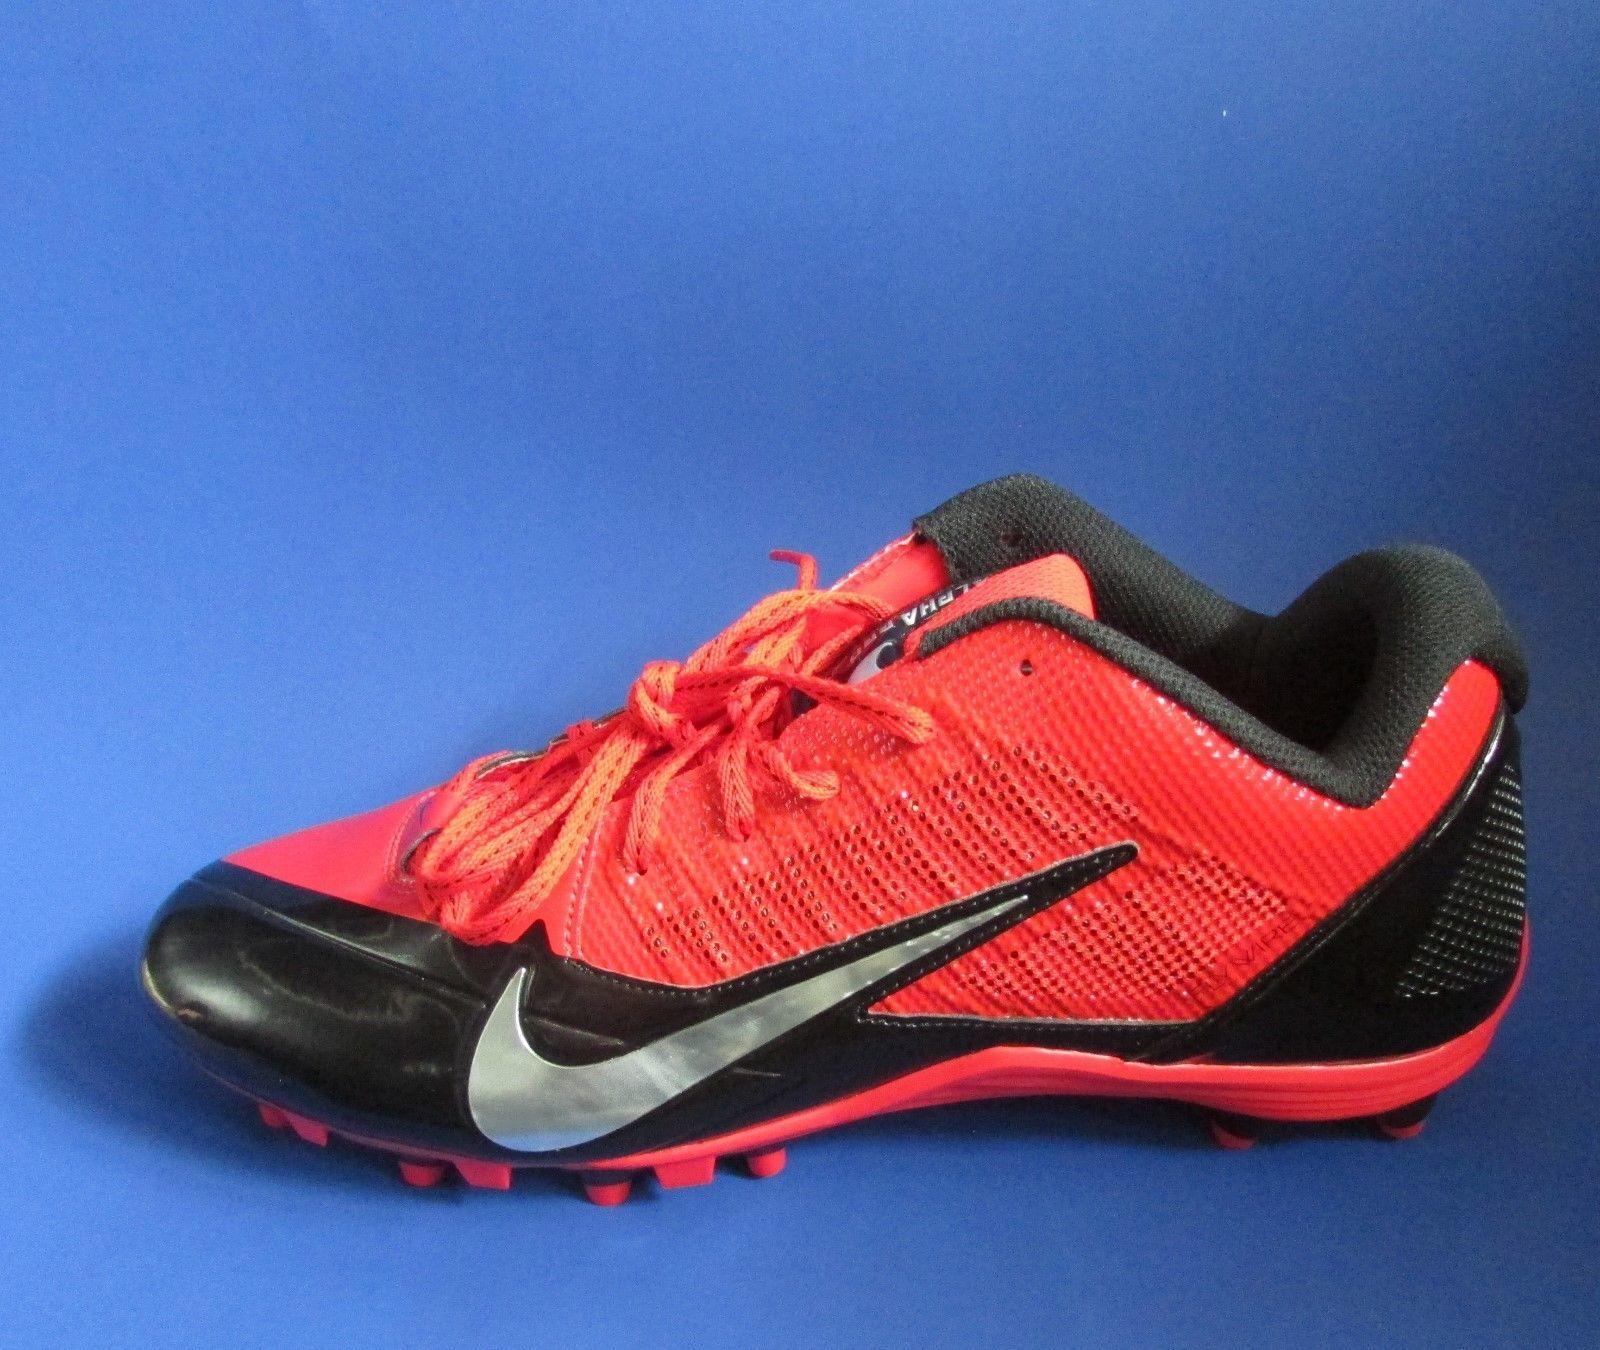 pretty nice 1b865 77266 Nike Alpha Pro Mid TD Football Cleats Black and 50 similar items. 57